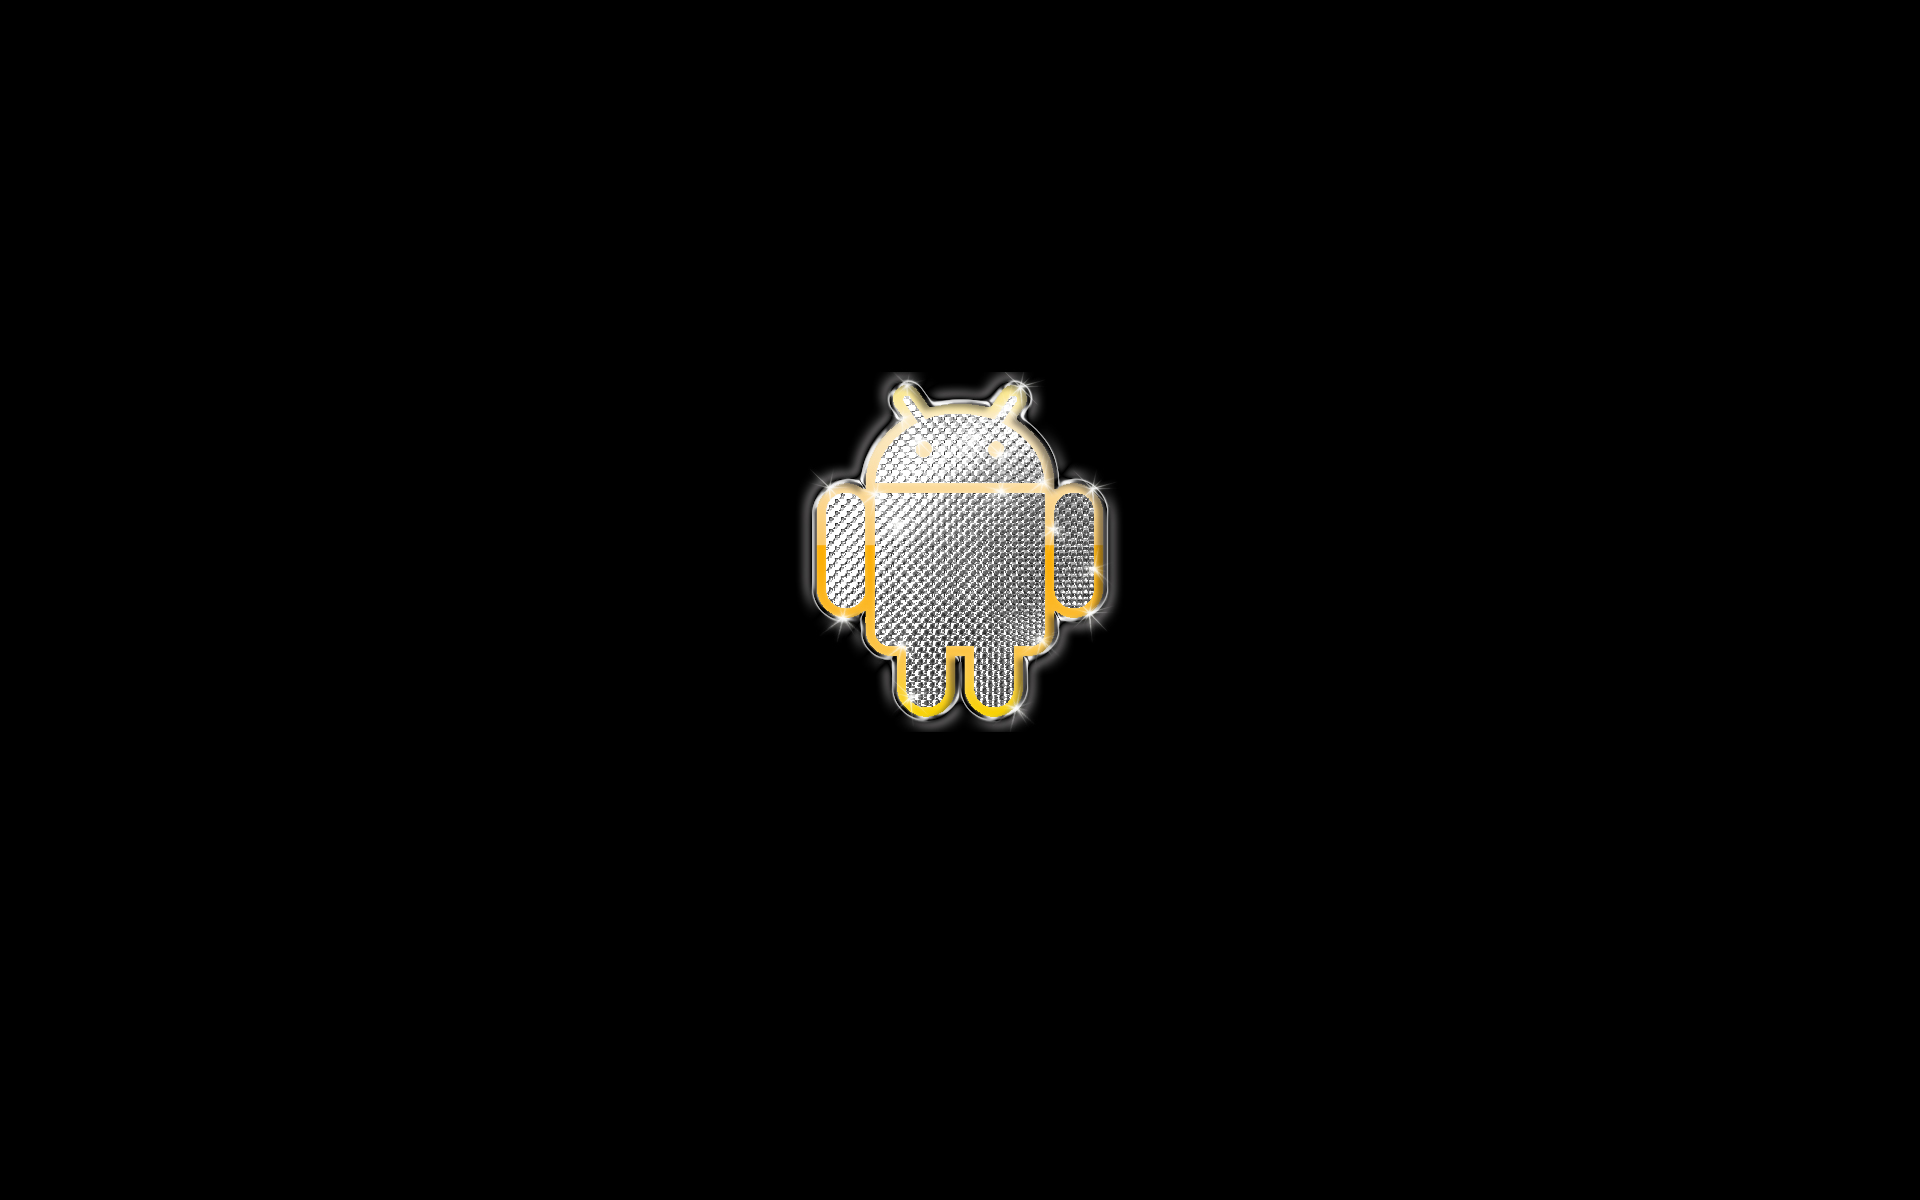 Apple Android Diamonds M by DeviantSith